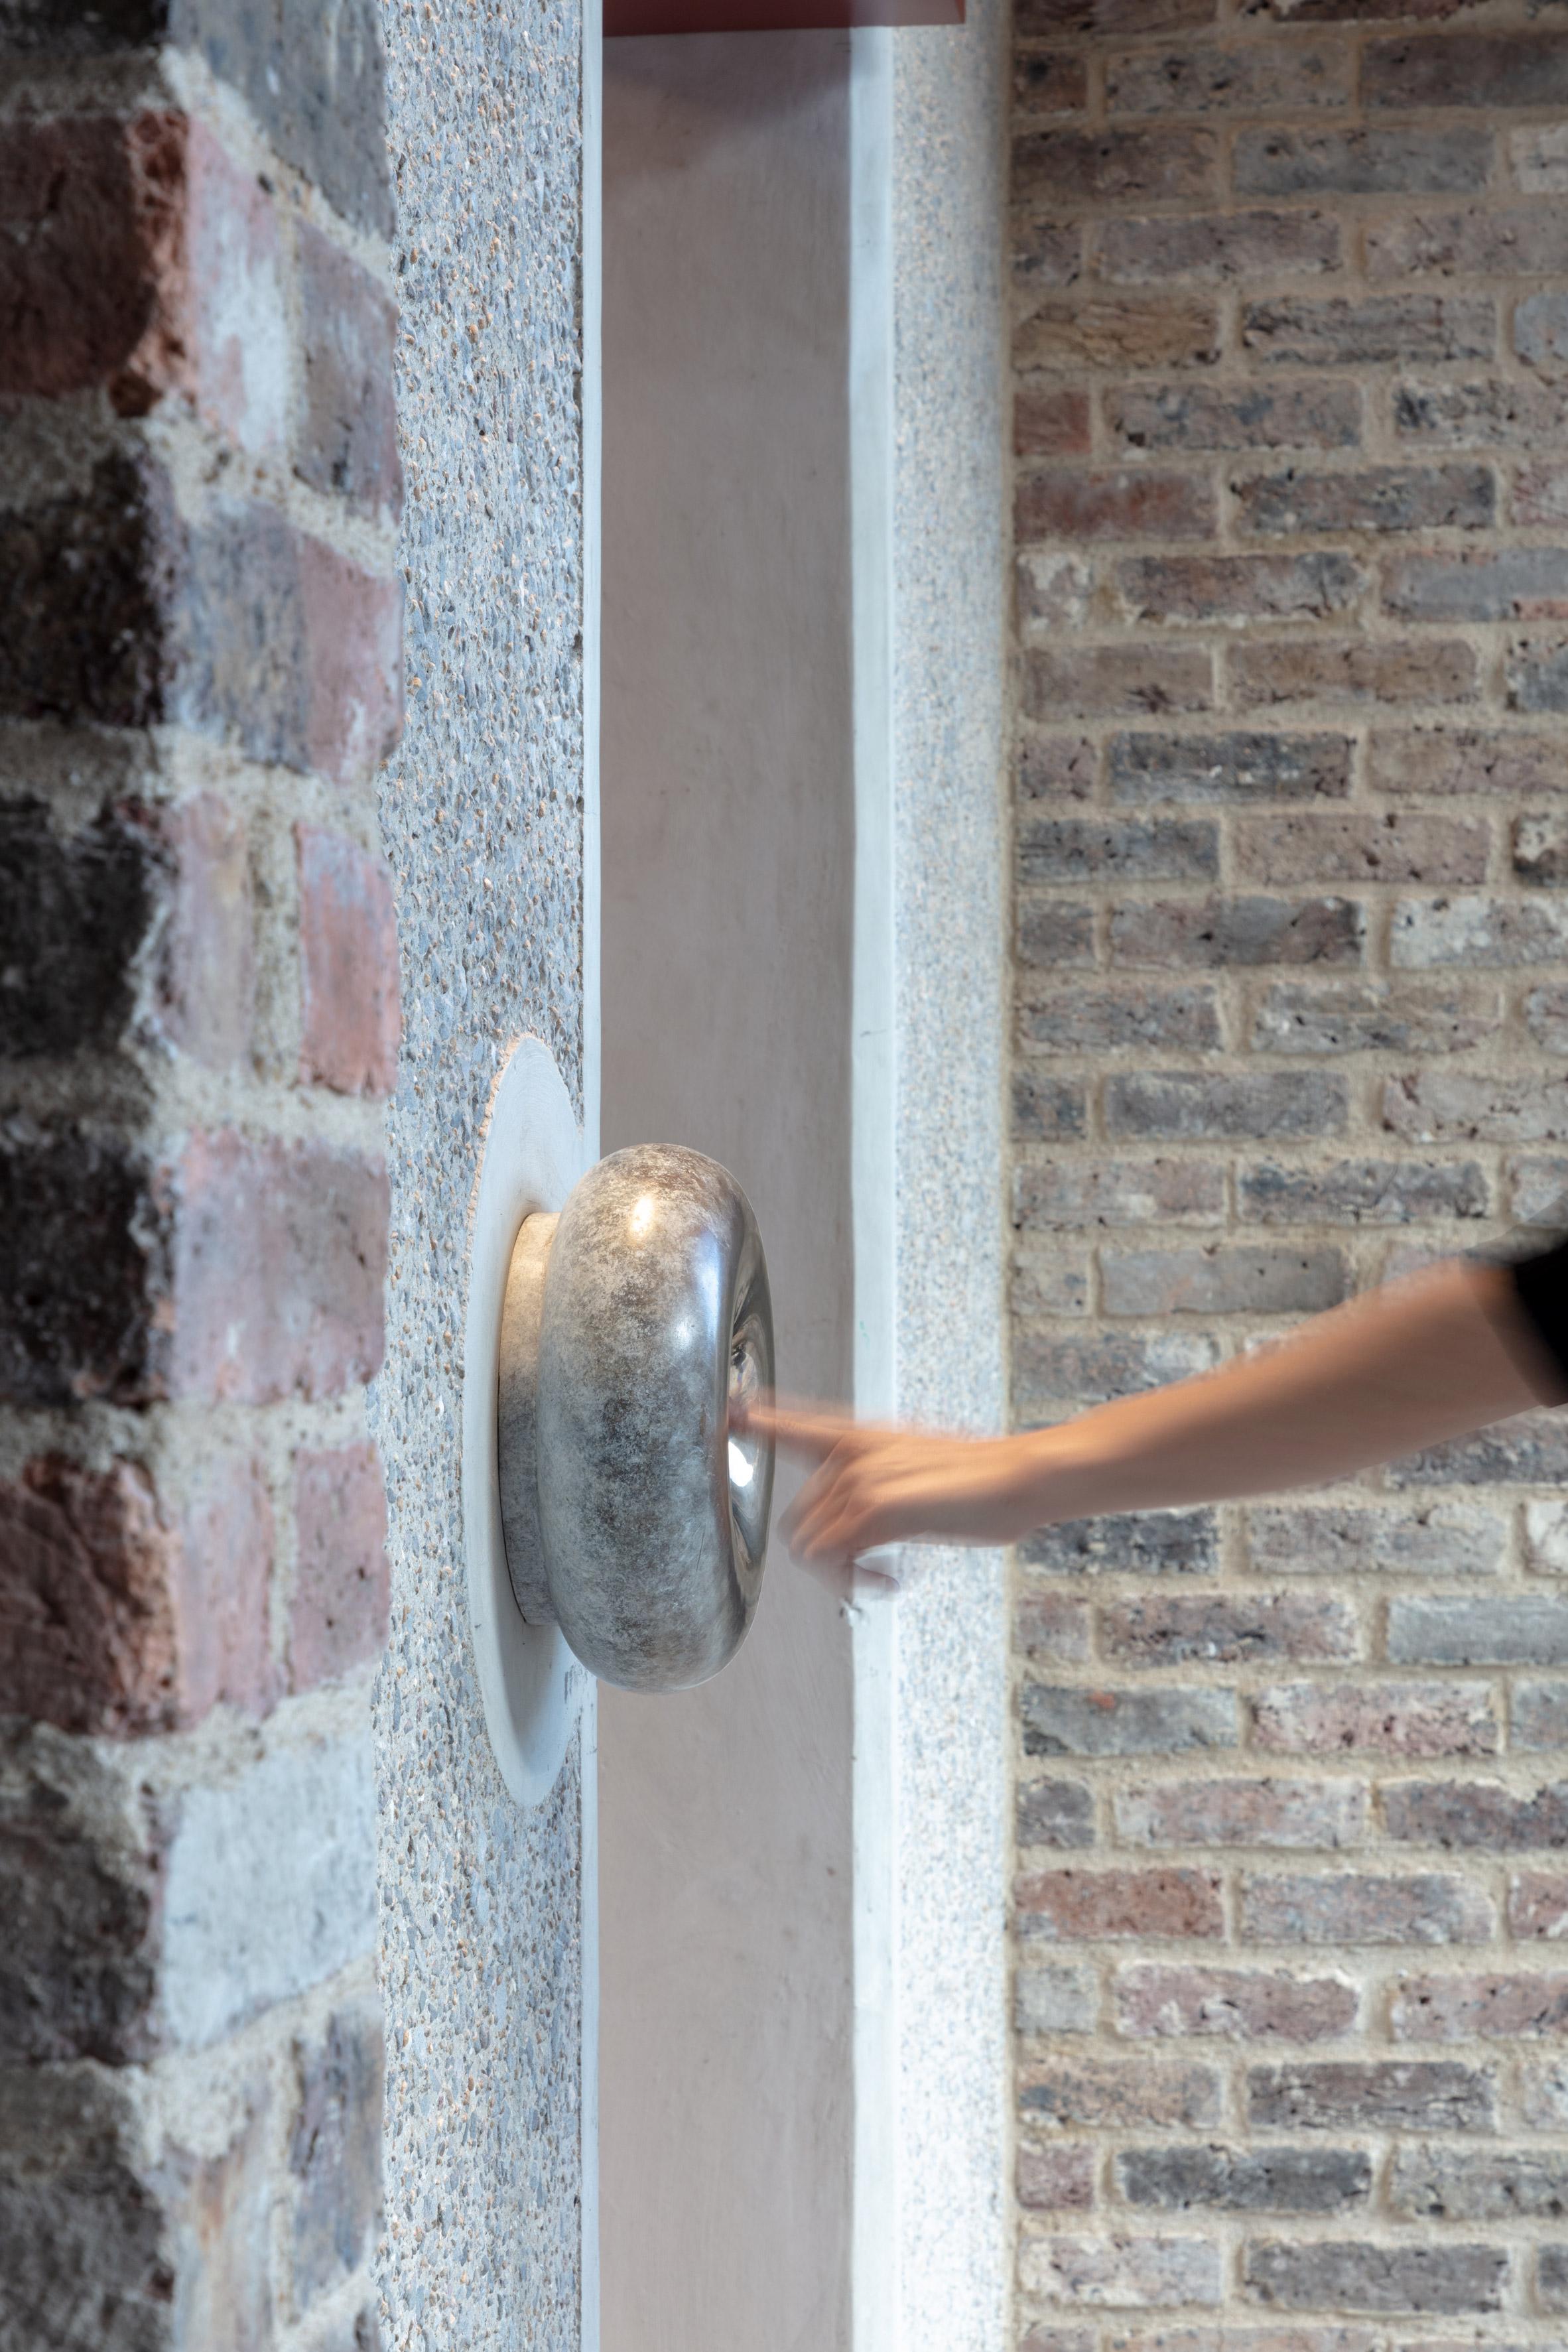 coal-drops-yard-thomas-heatherwick-studio-kings-cross-architecture_dezeen_2364_col_11